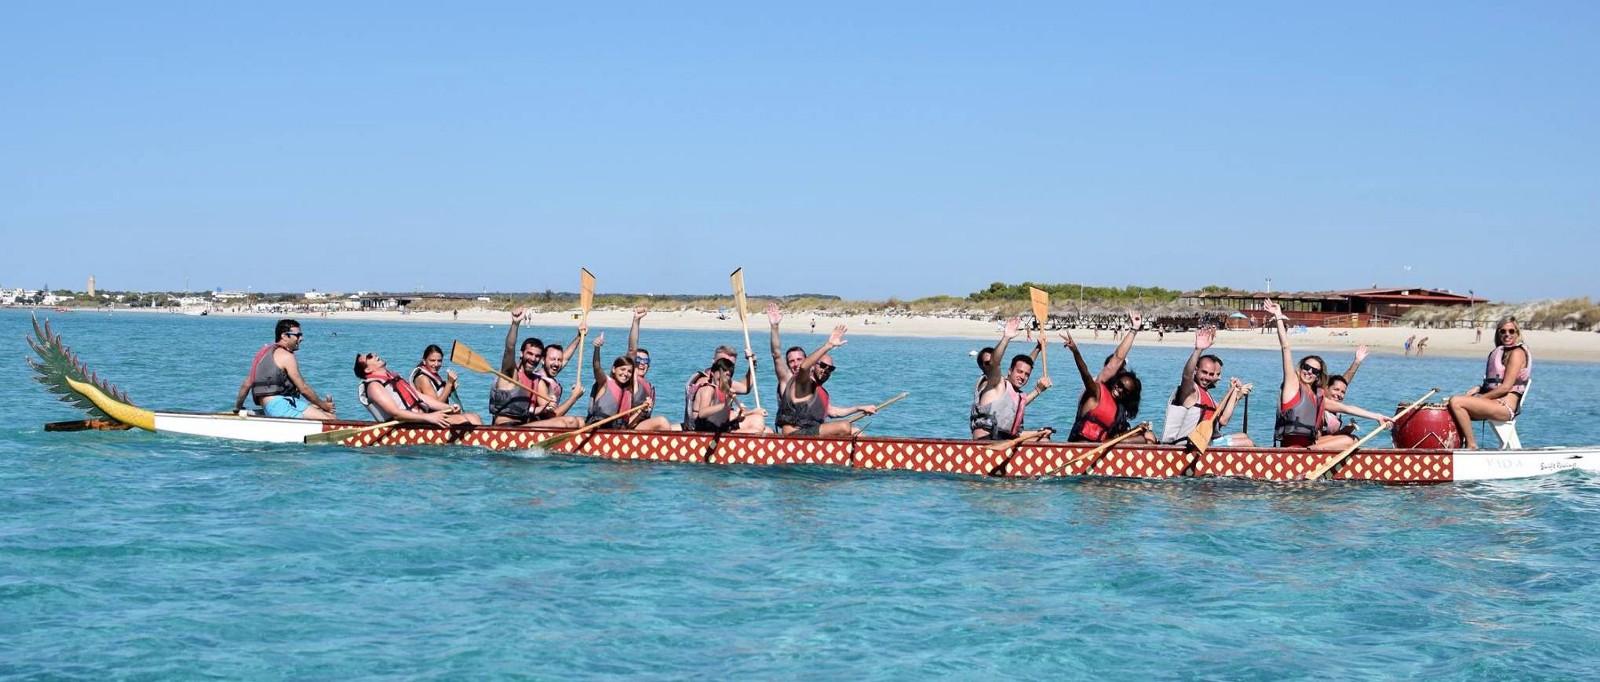 Revevol Team on a Boat in Italy